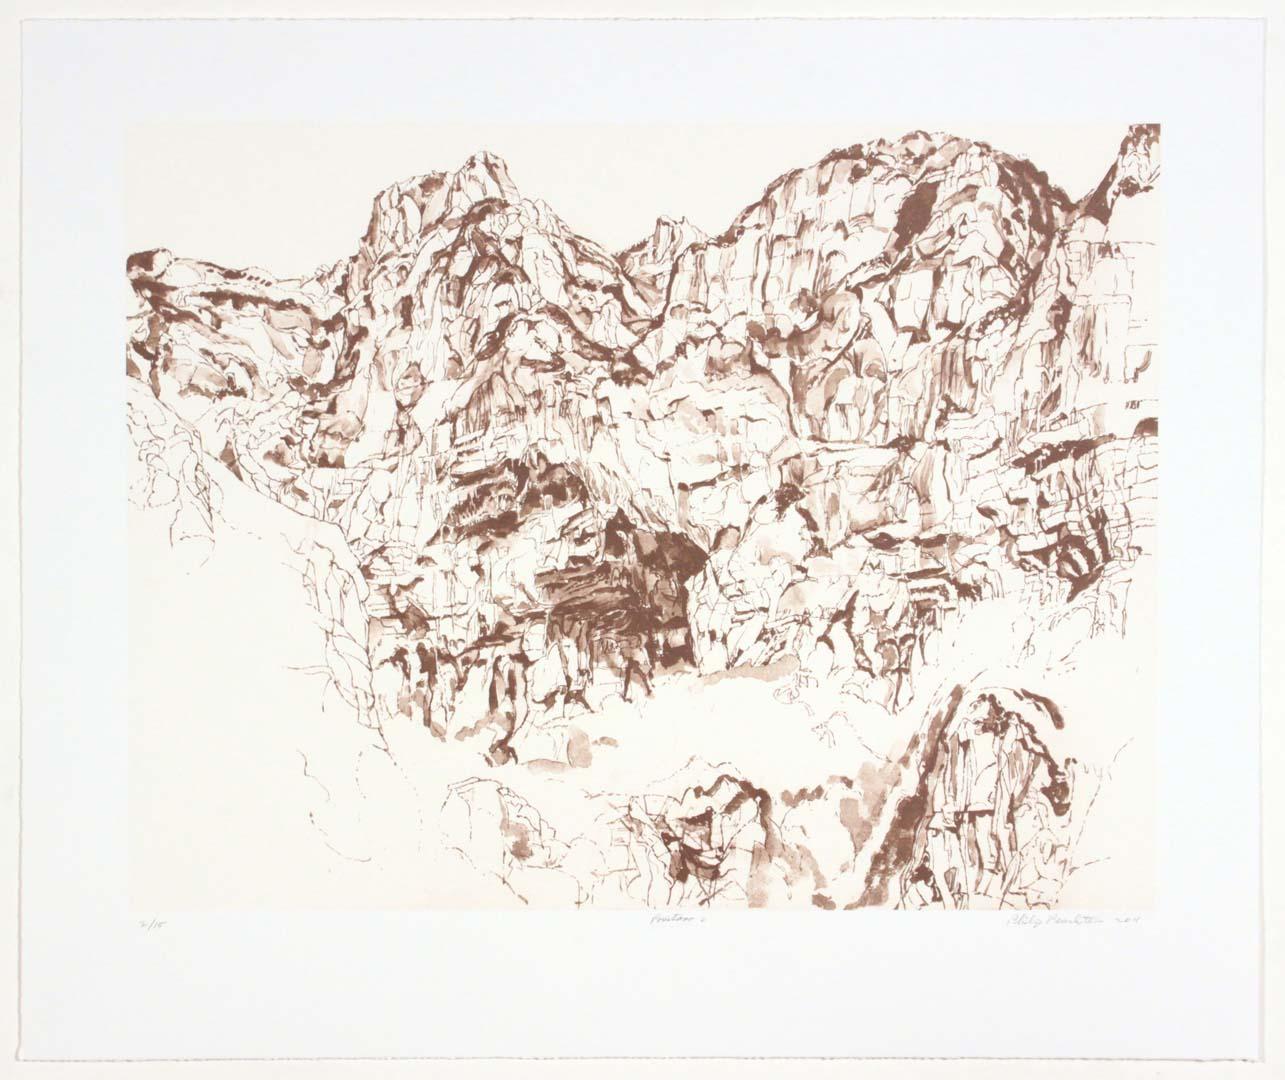 2011 Positano #2 Lithograph on Paper 20.625 x 24.625